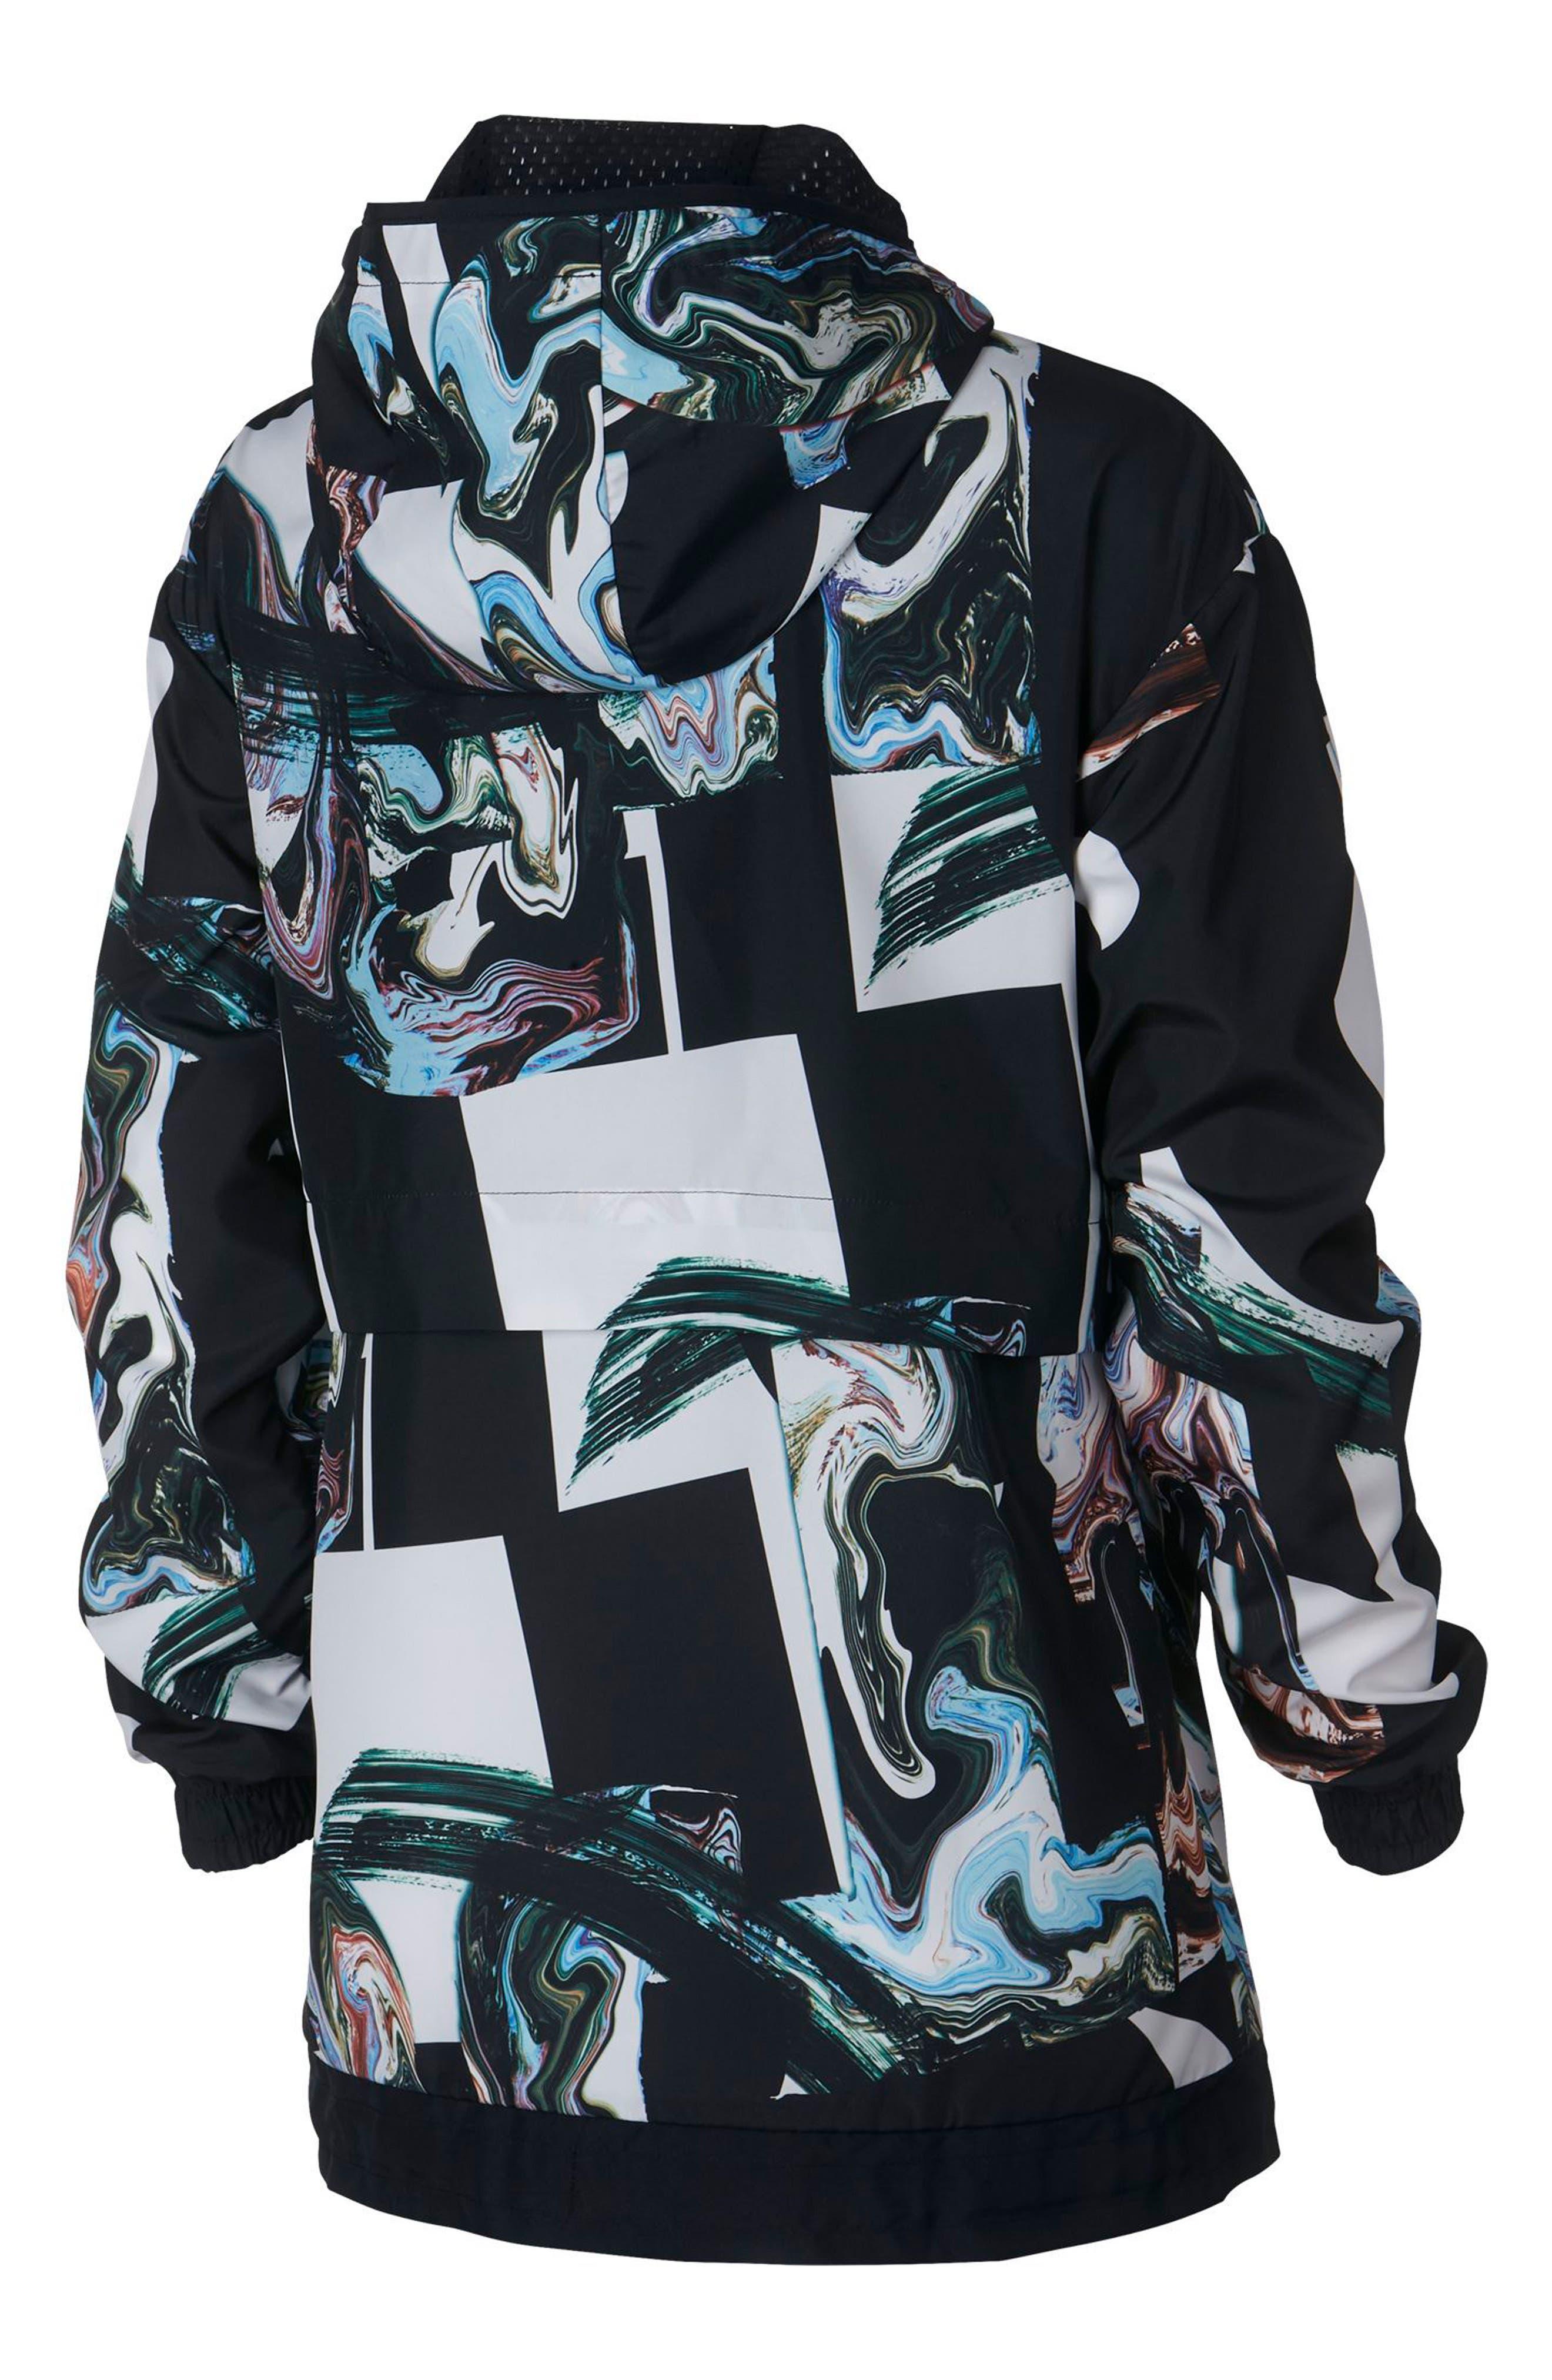 Sportswear Women's Marble Print Hooded Jacket,                             Alternate thumbnail 2, color,